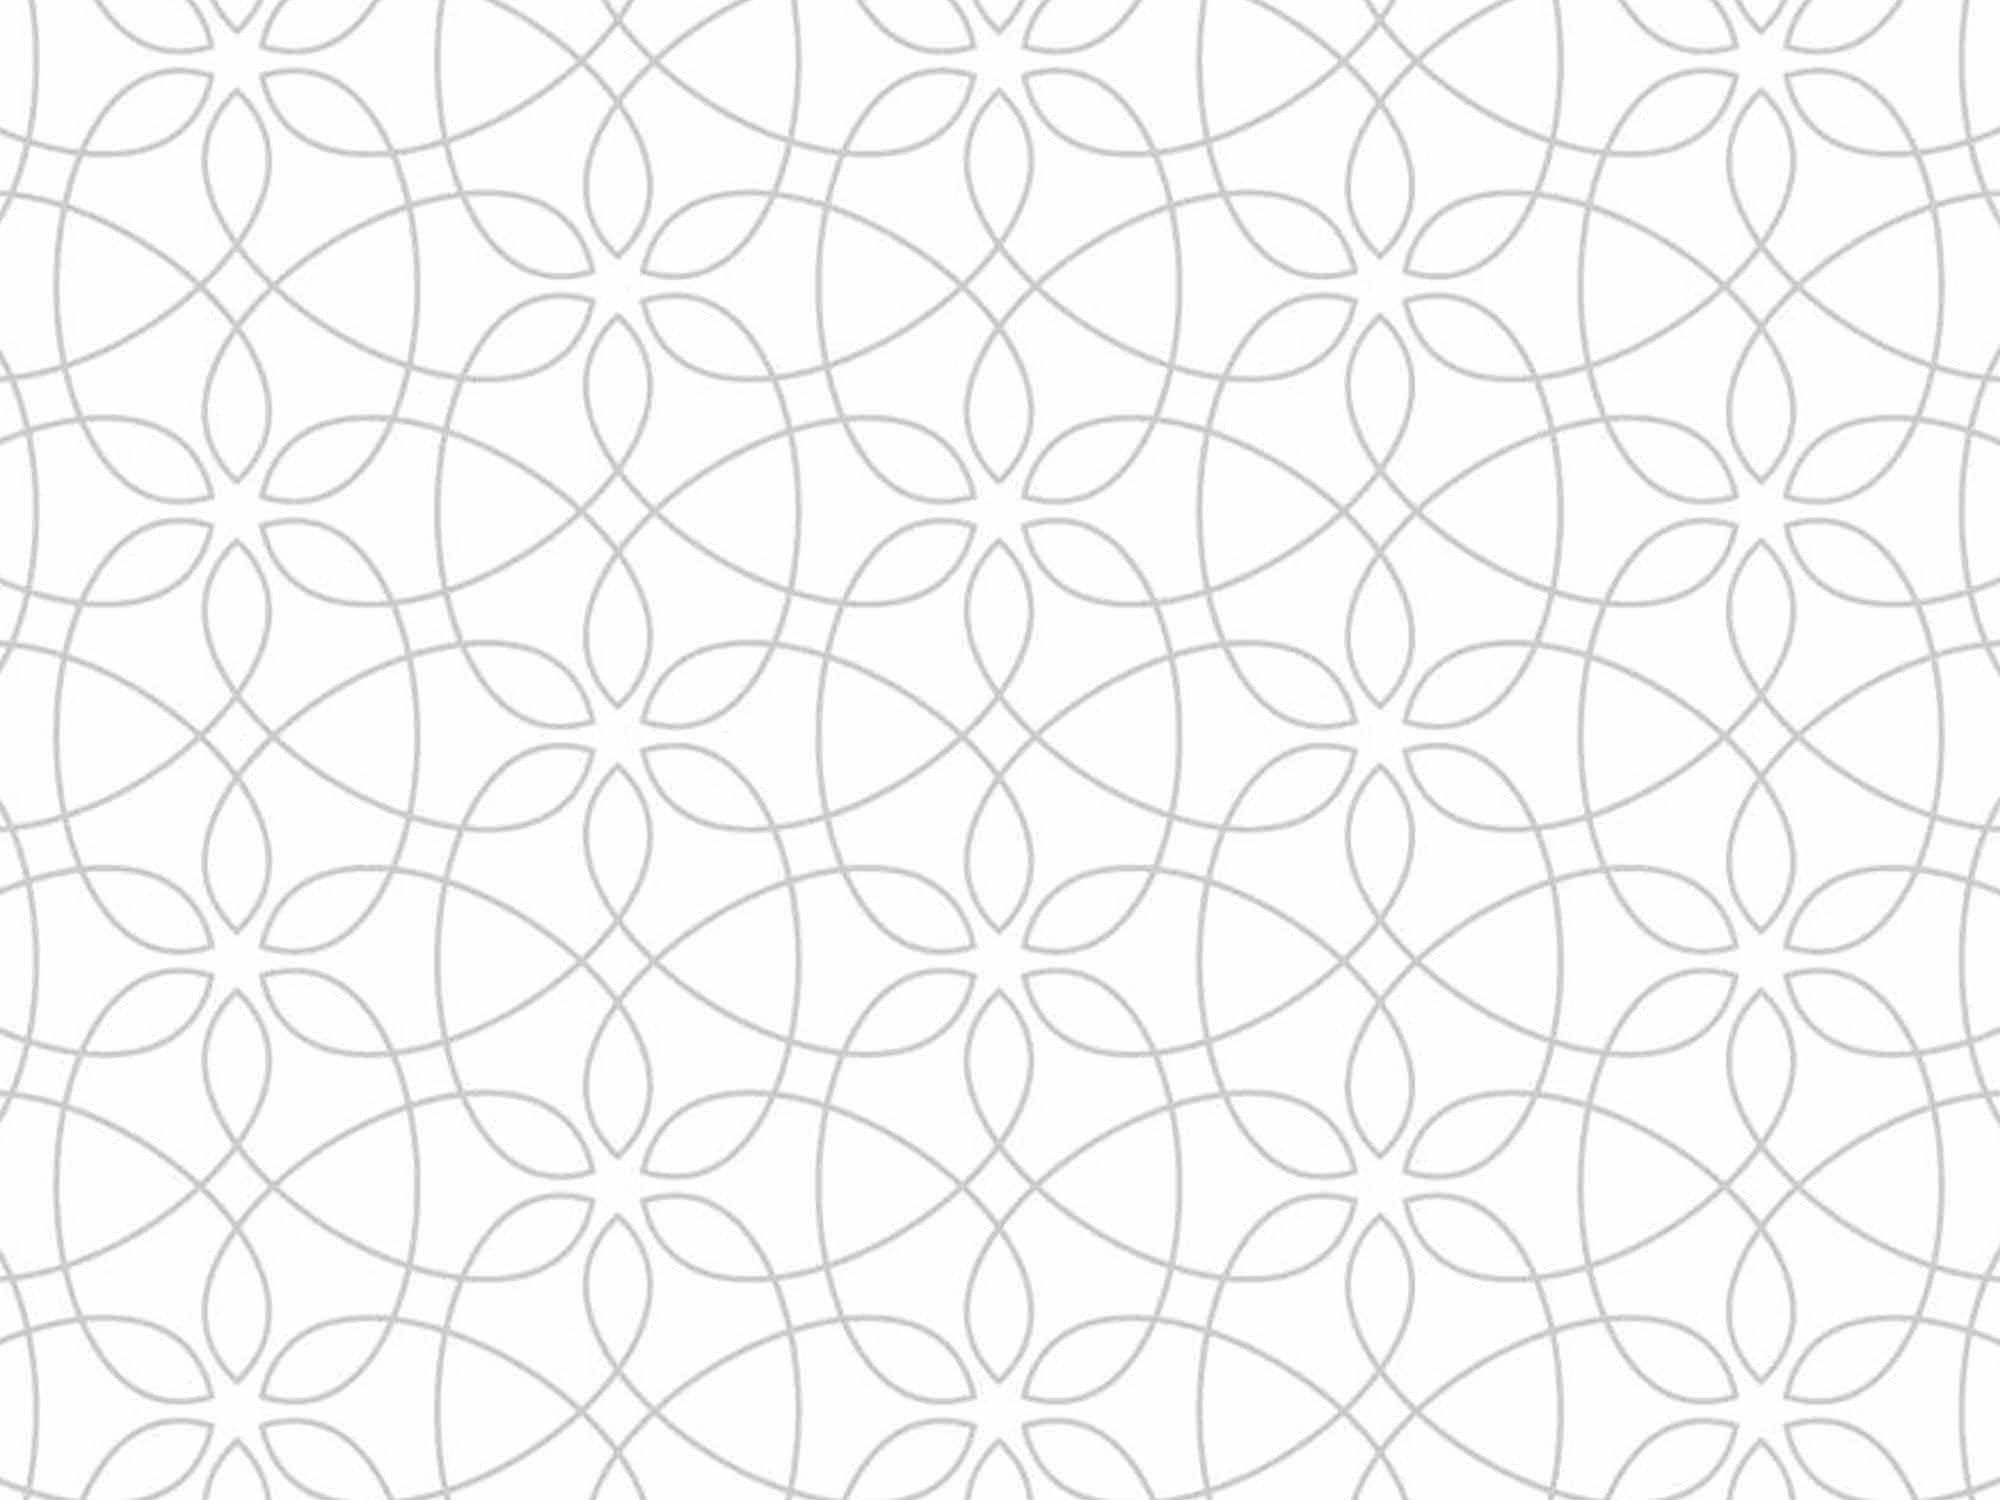 Papel de Parede para Sala Geométrico 0057 - Adesivos de Parede  - Paredes Decoradas